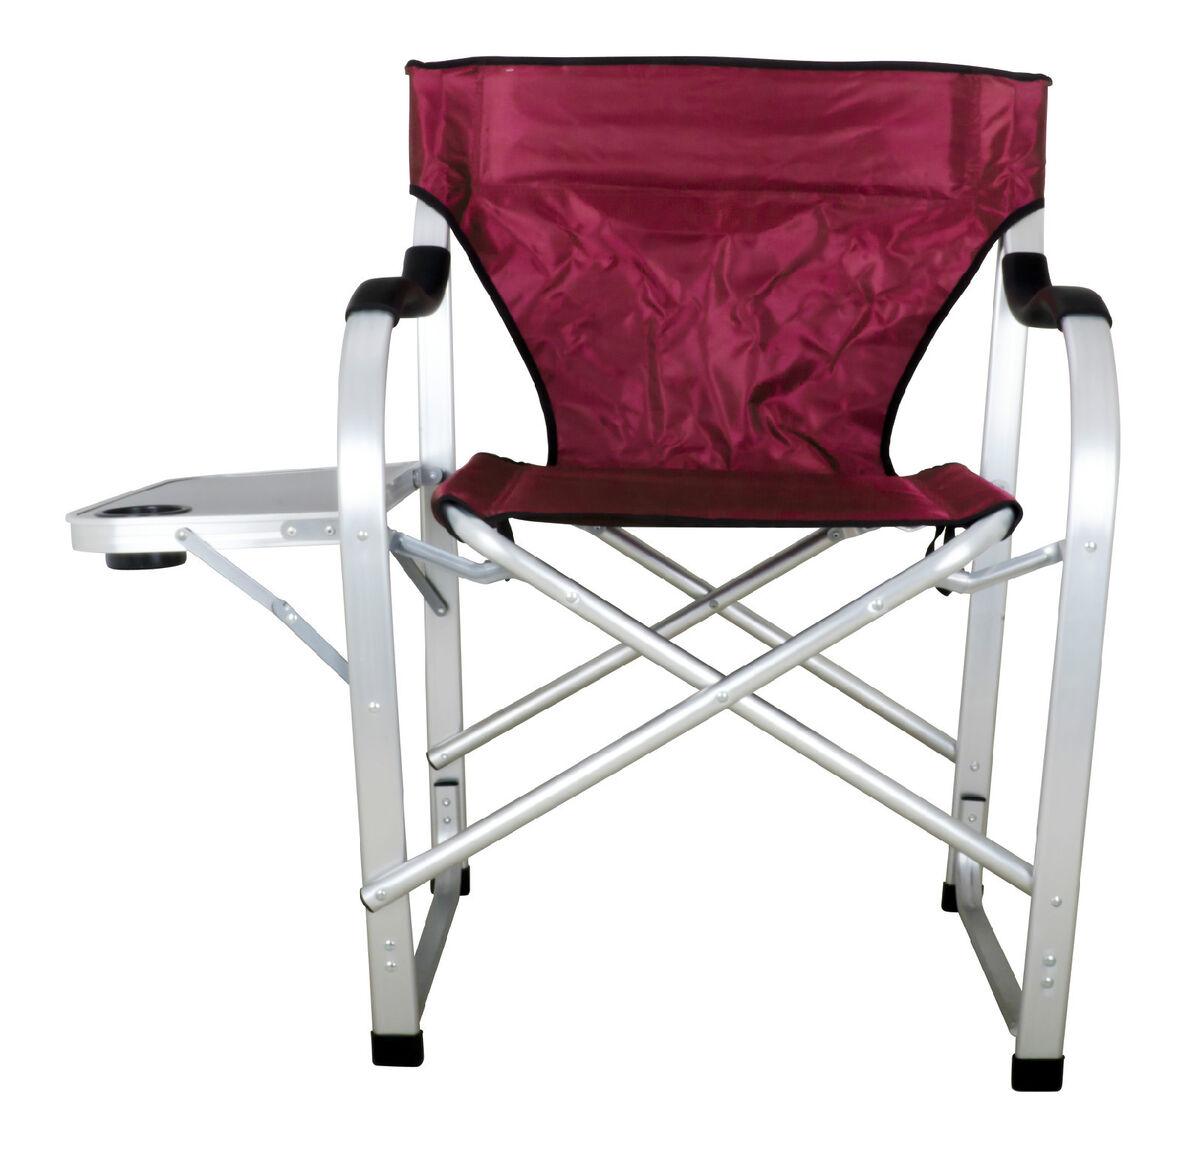 Heavy Duty Camping Outdoor Director Chair Big Boy Chair w Table SL1215 Burgundy